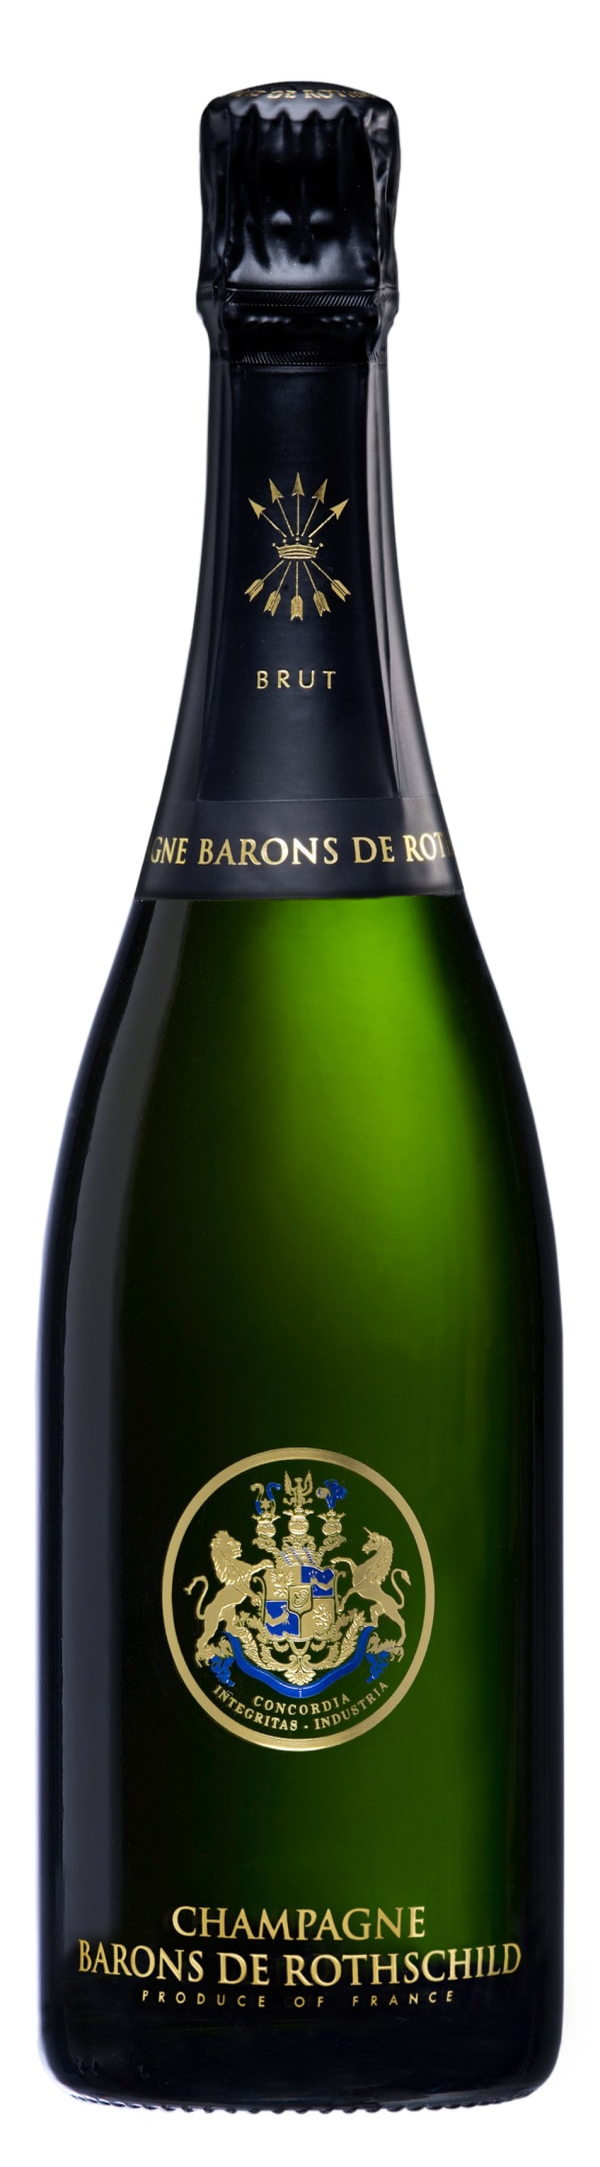 Barons de Rothschild Champagne Brut